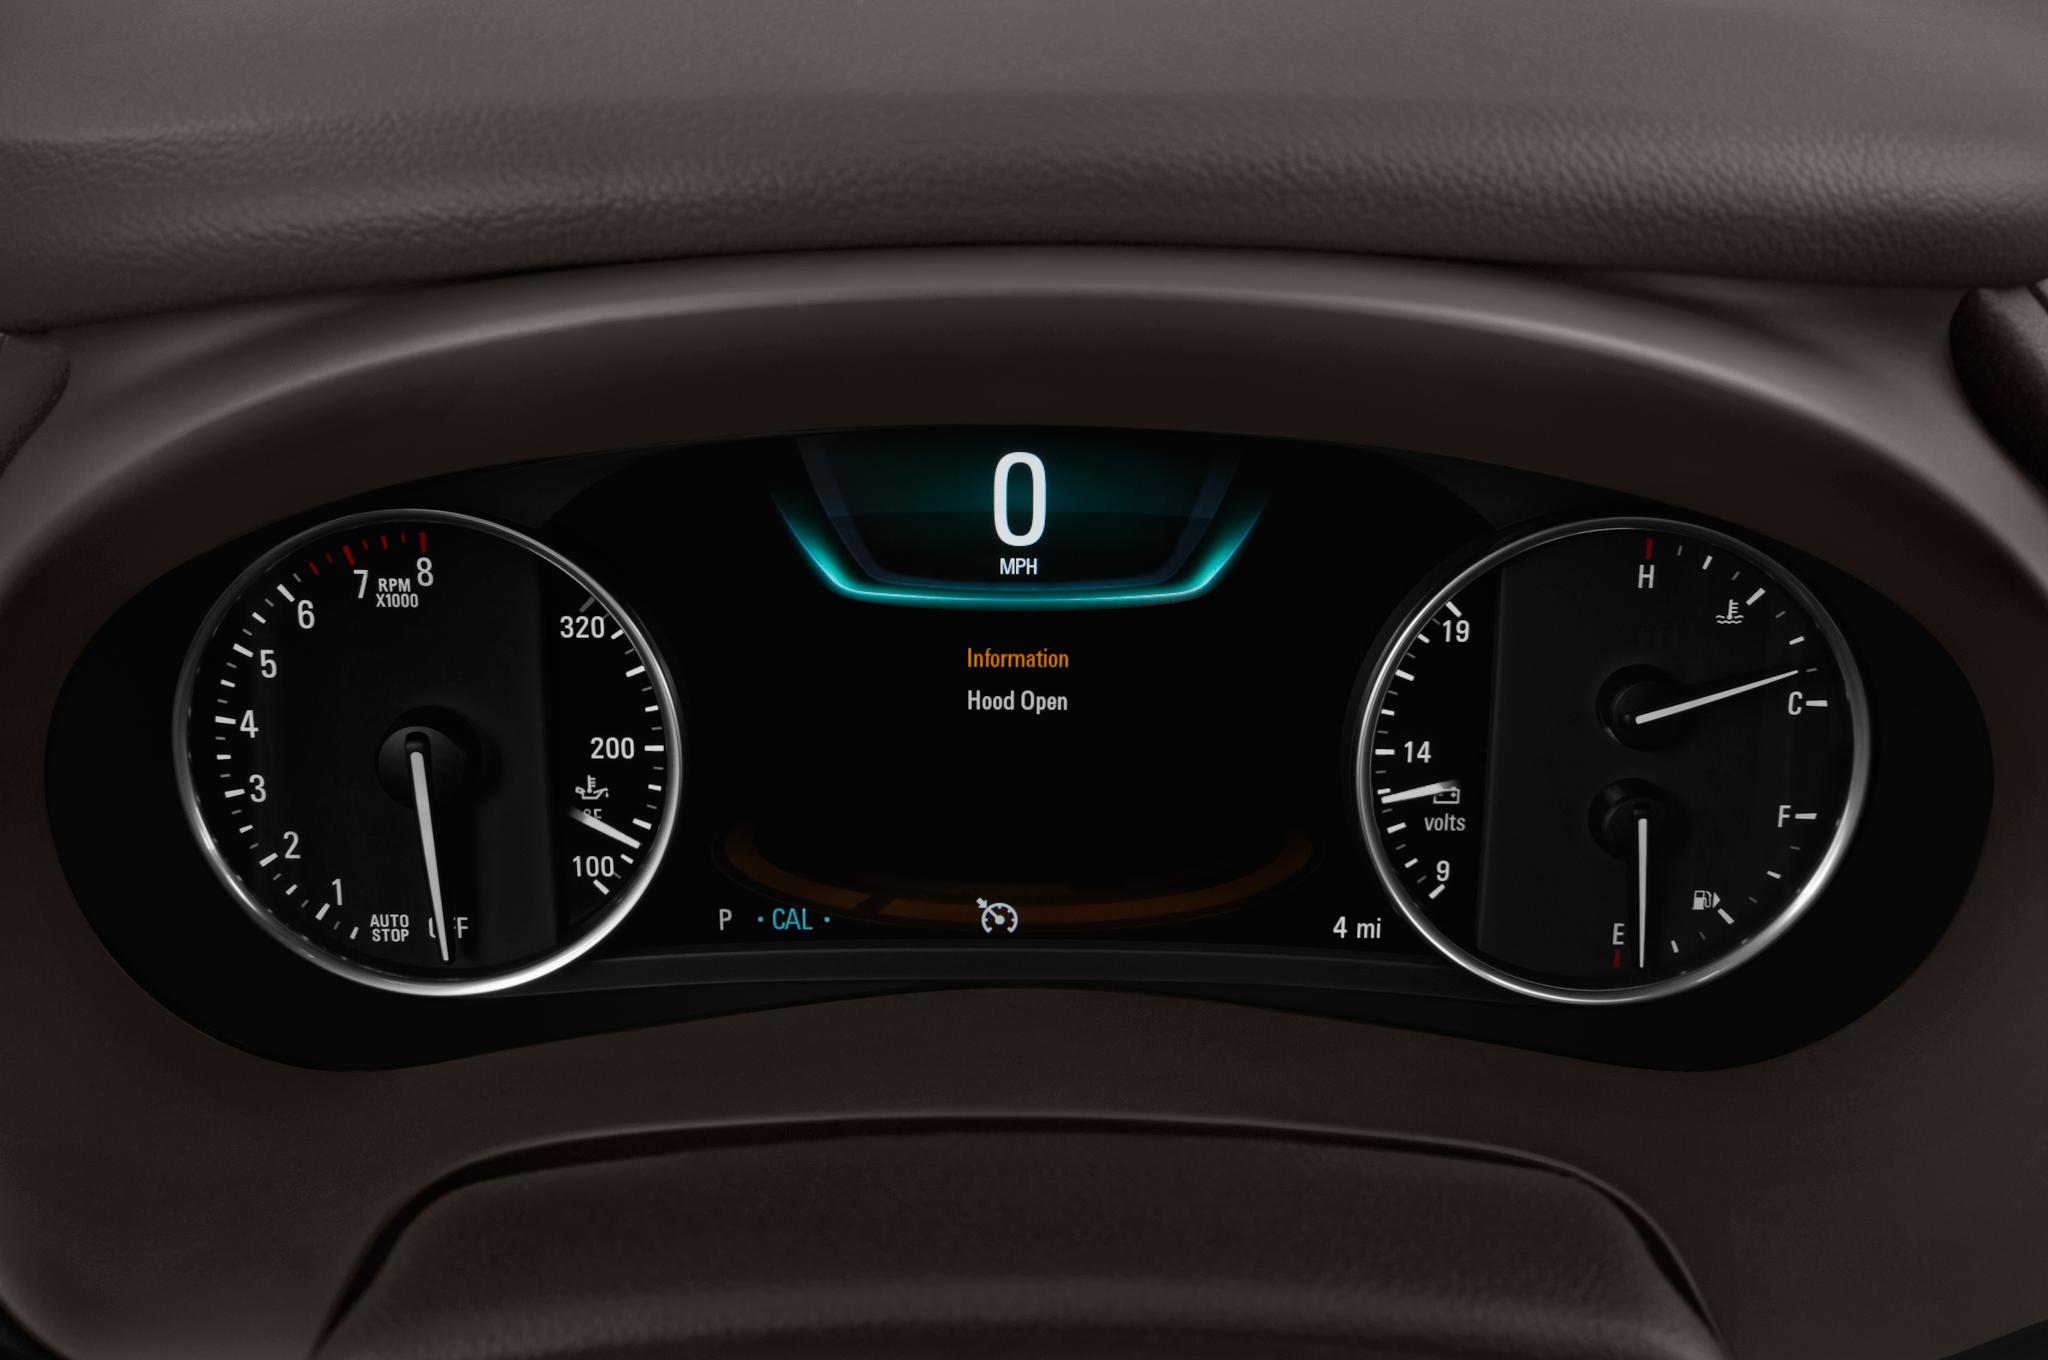 2018 Buick LaCrosse Avenir Gets Upscale Design   Automobile Magazine